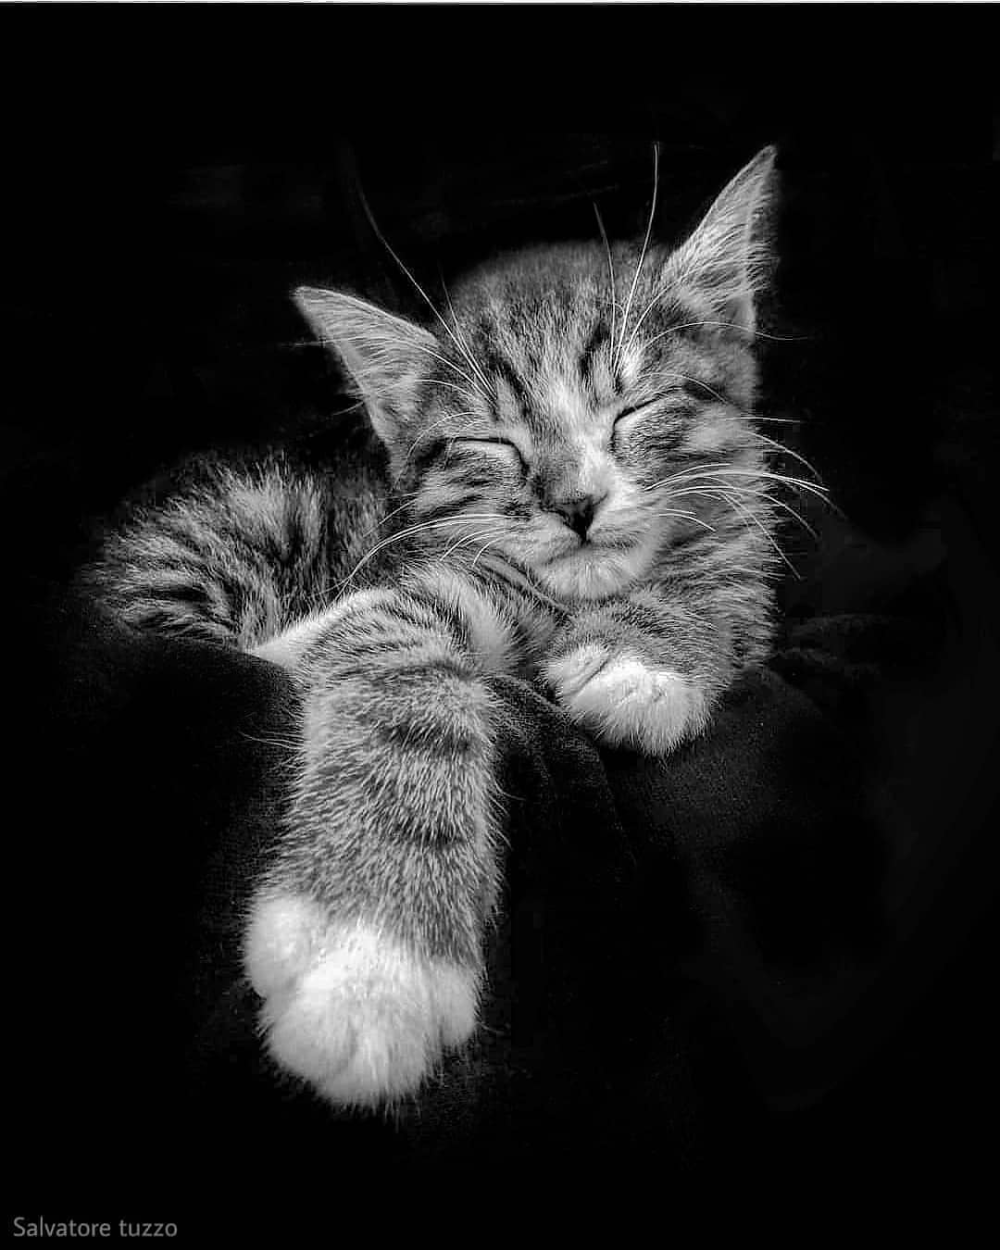 Chat En Noir Et Blanc Chat Noiretblanc Blackandwhite Photo Salvatore Tuzzo Instagram Animals Black And White Gorgeous Cats Cat Photography